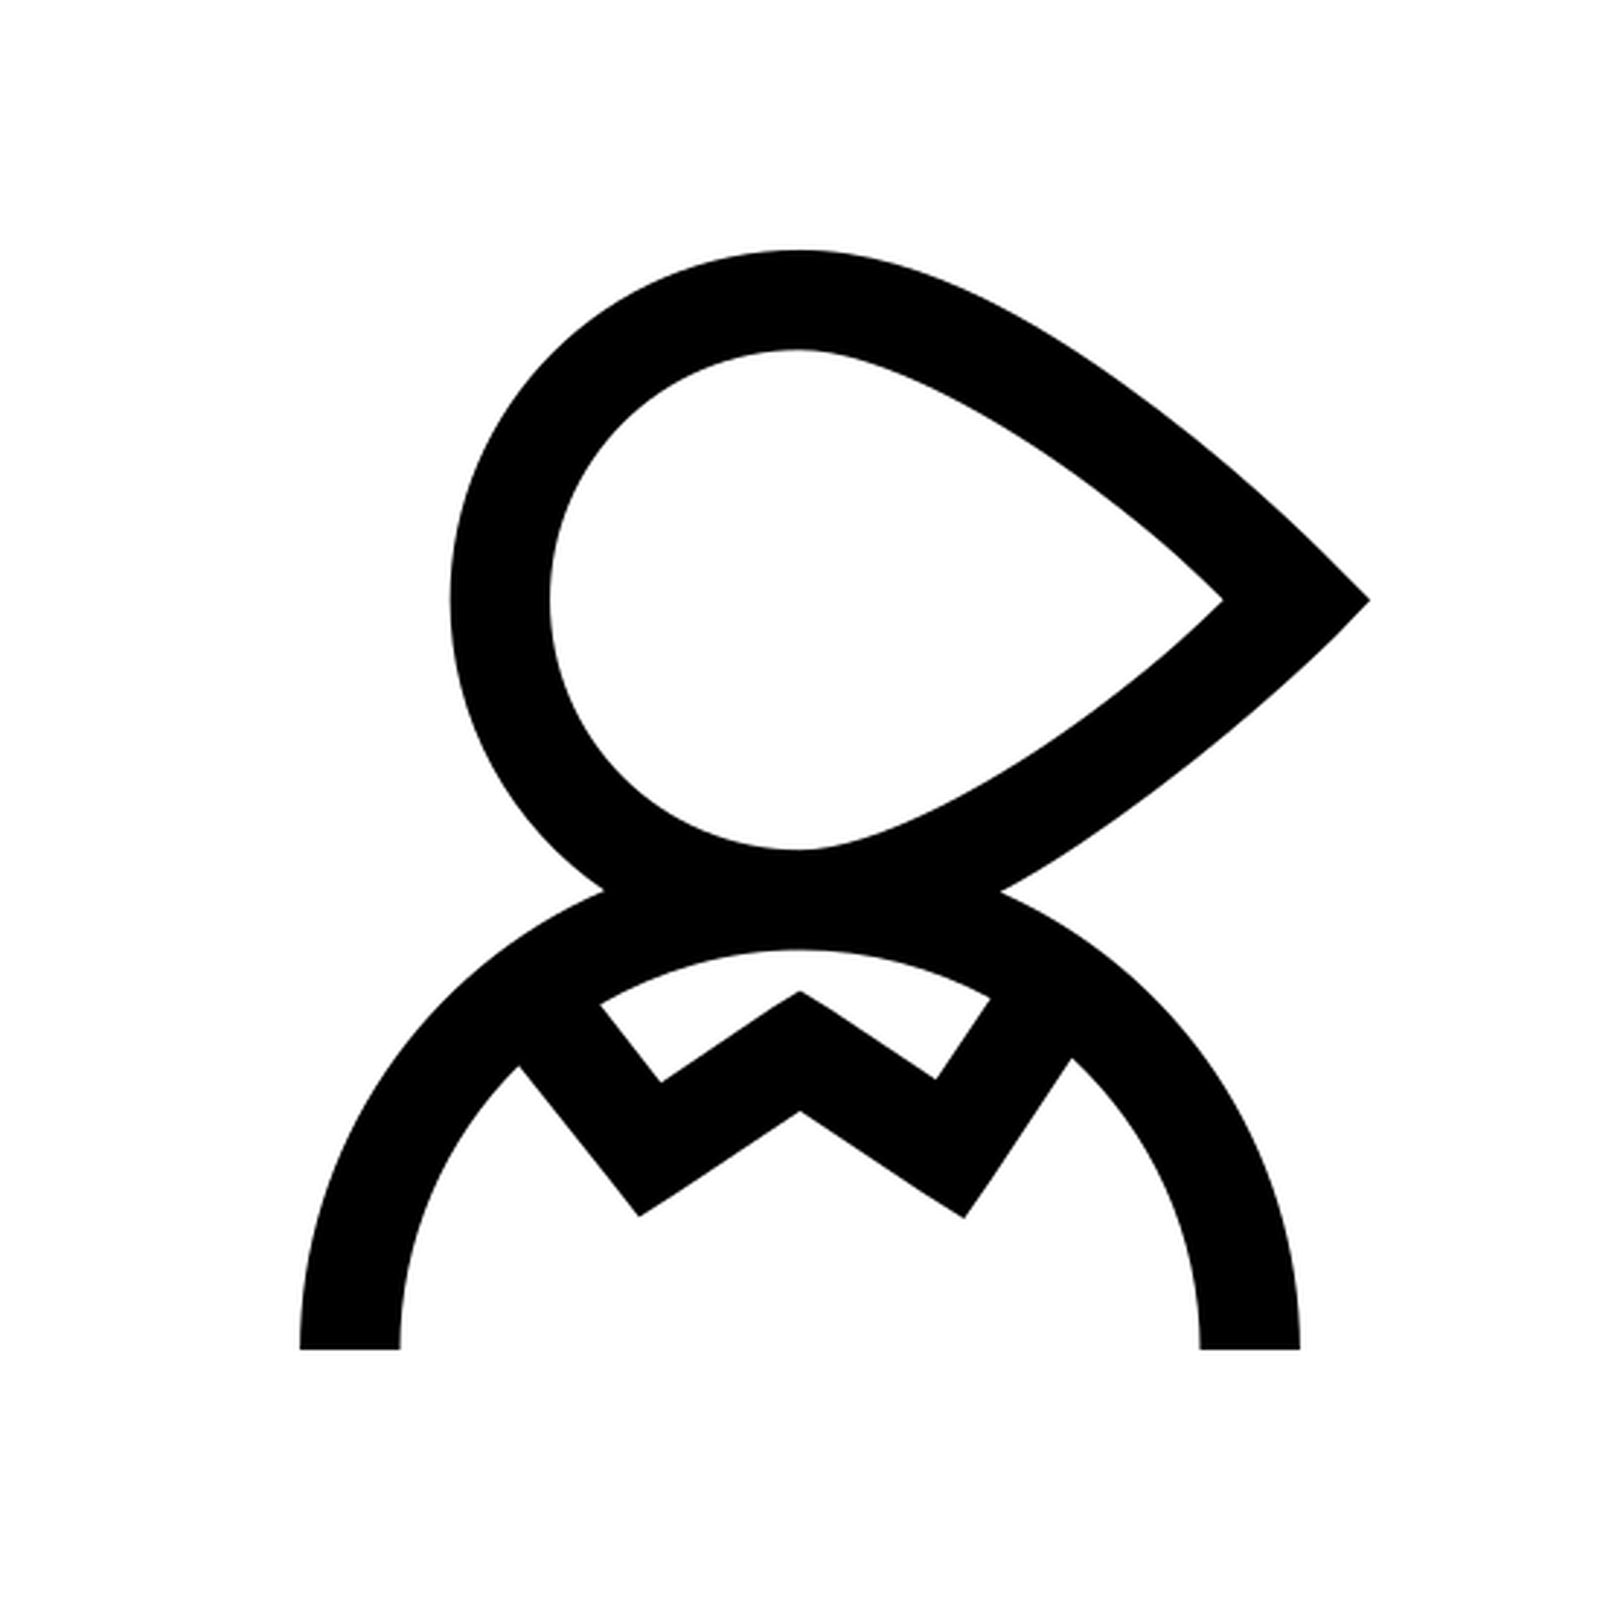 Woman Profile icon